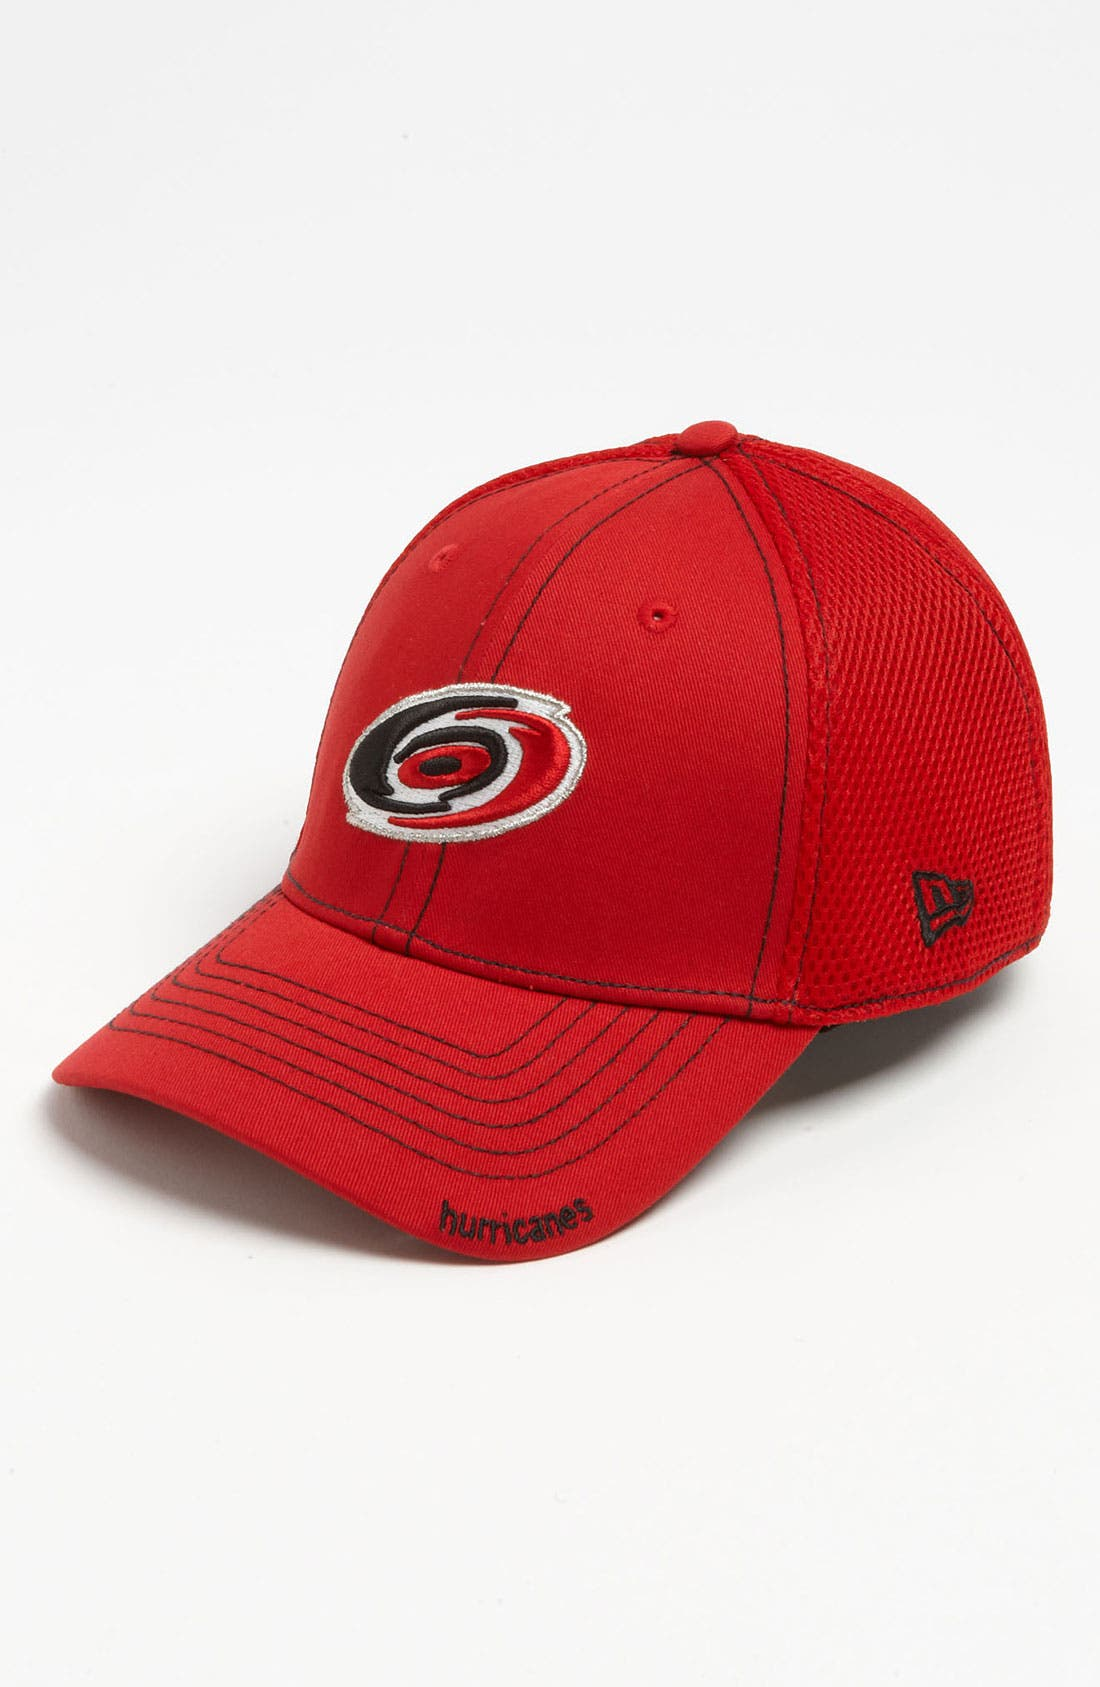 Main Image - New Era Cap 'Neo - Carolina Hurricanes' Baseball Cap